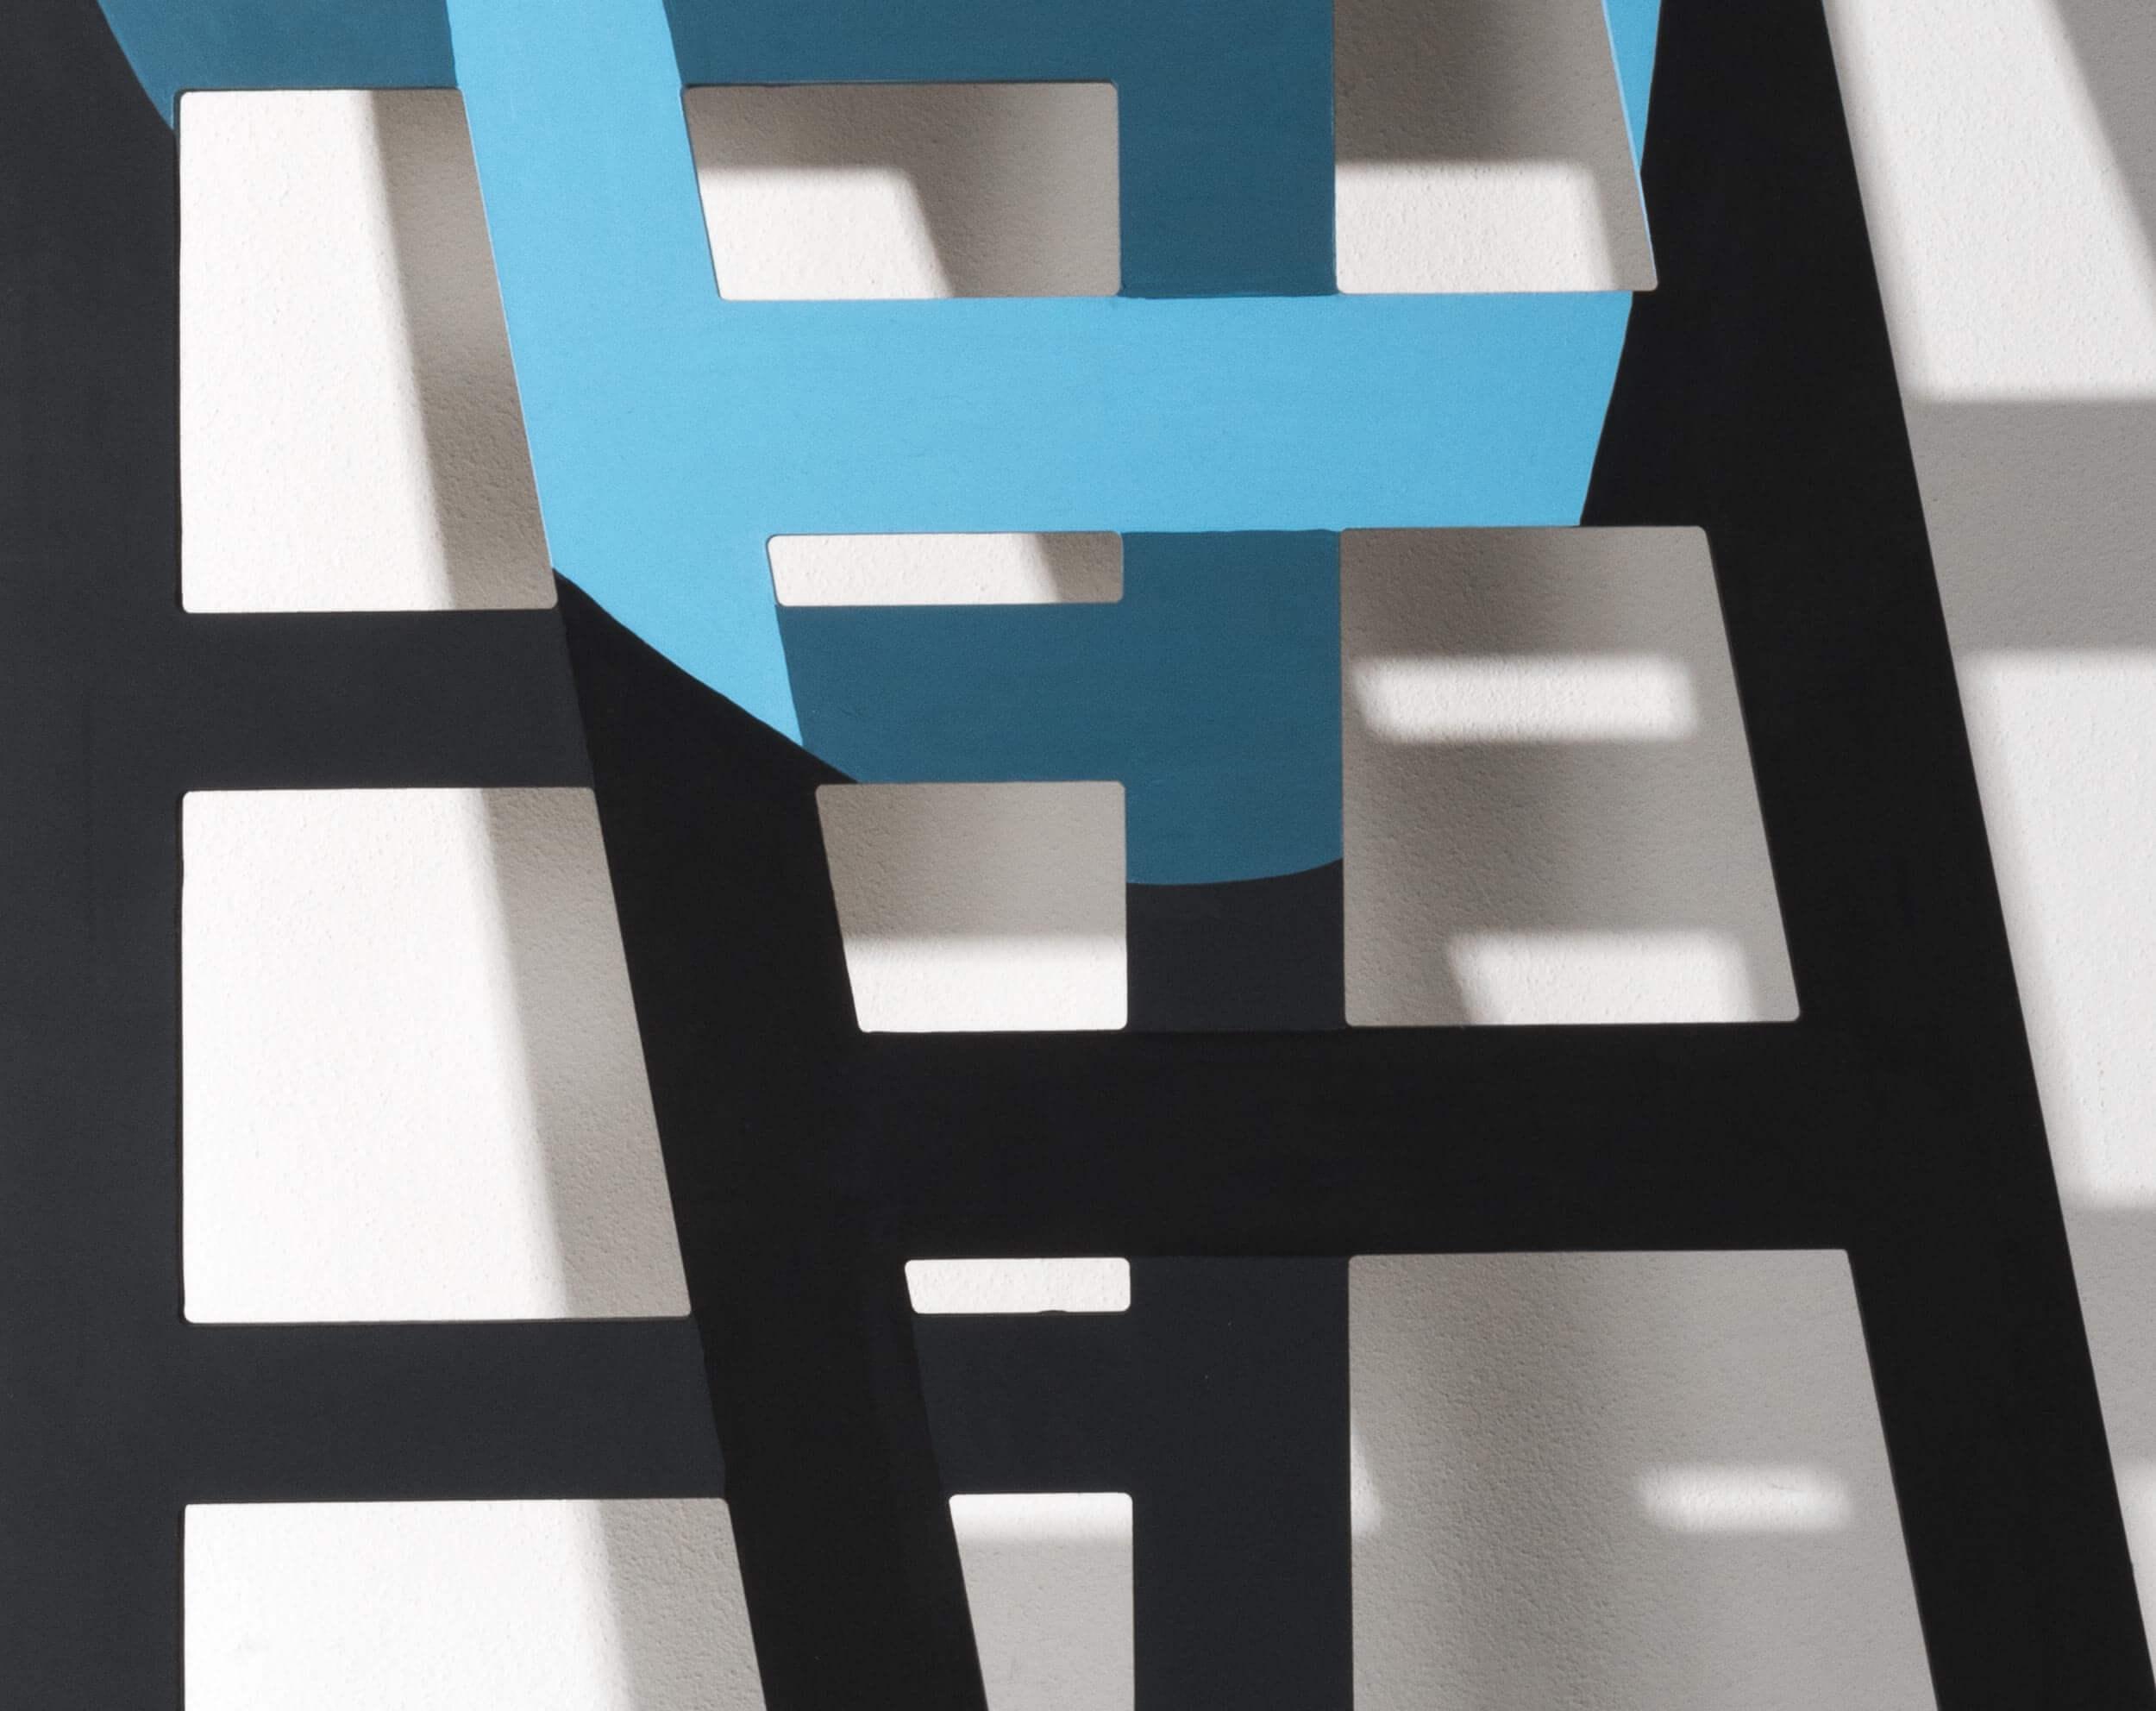 Ladder1_particolare_indoor